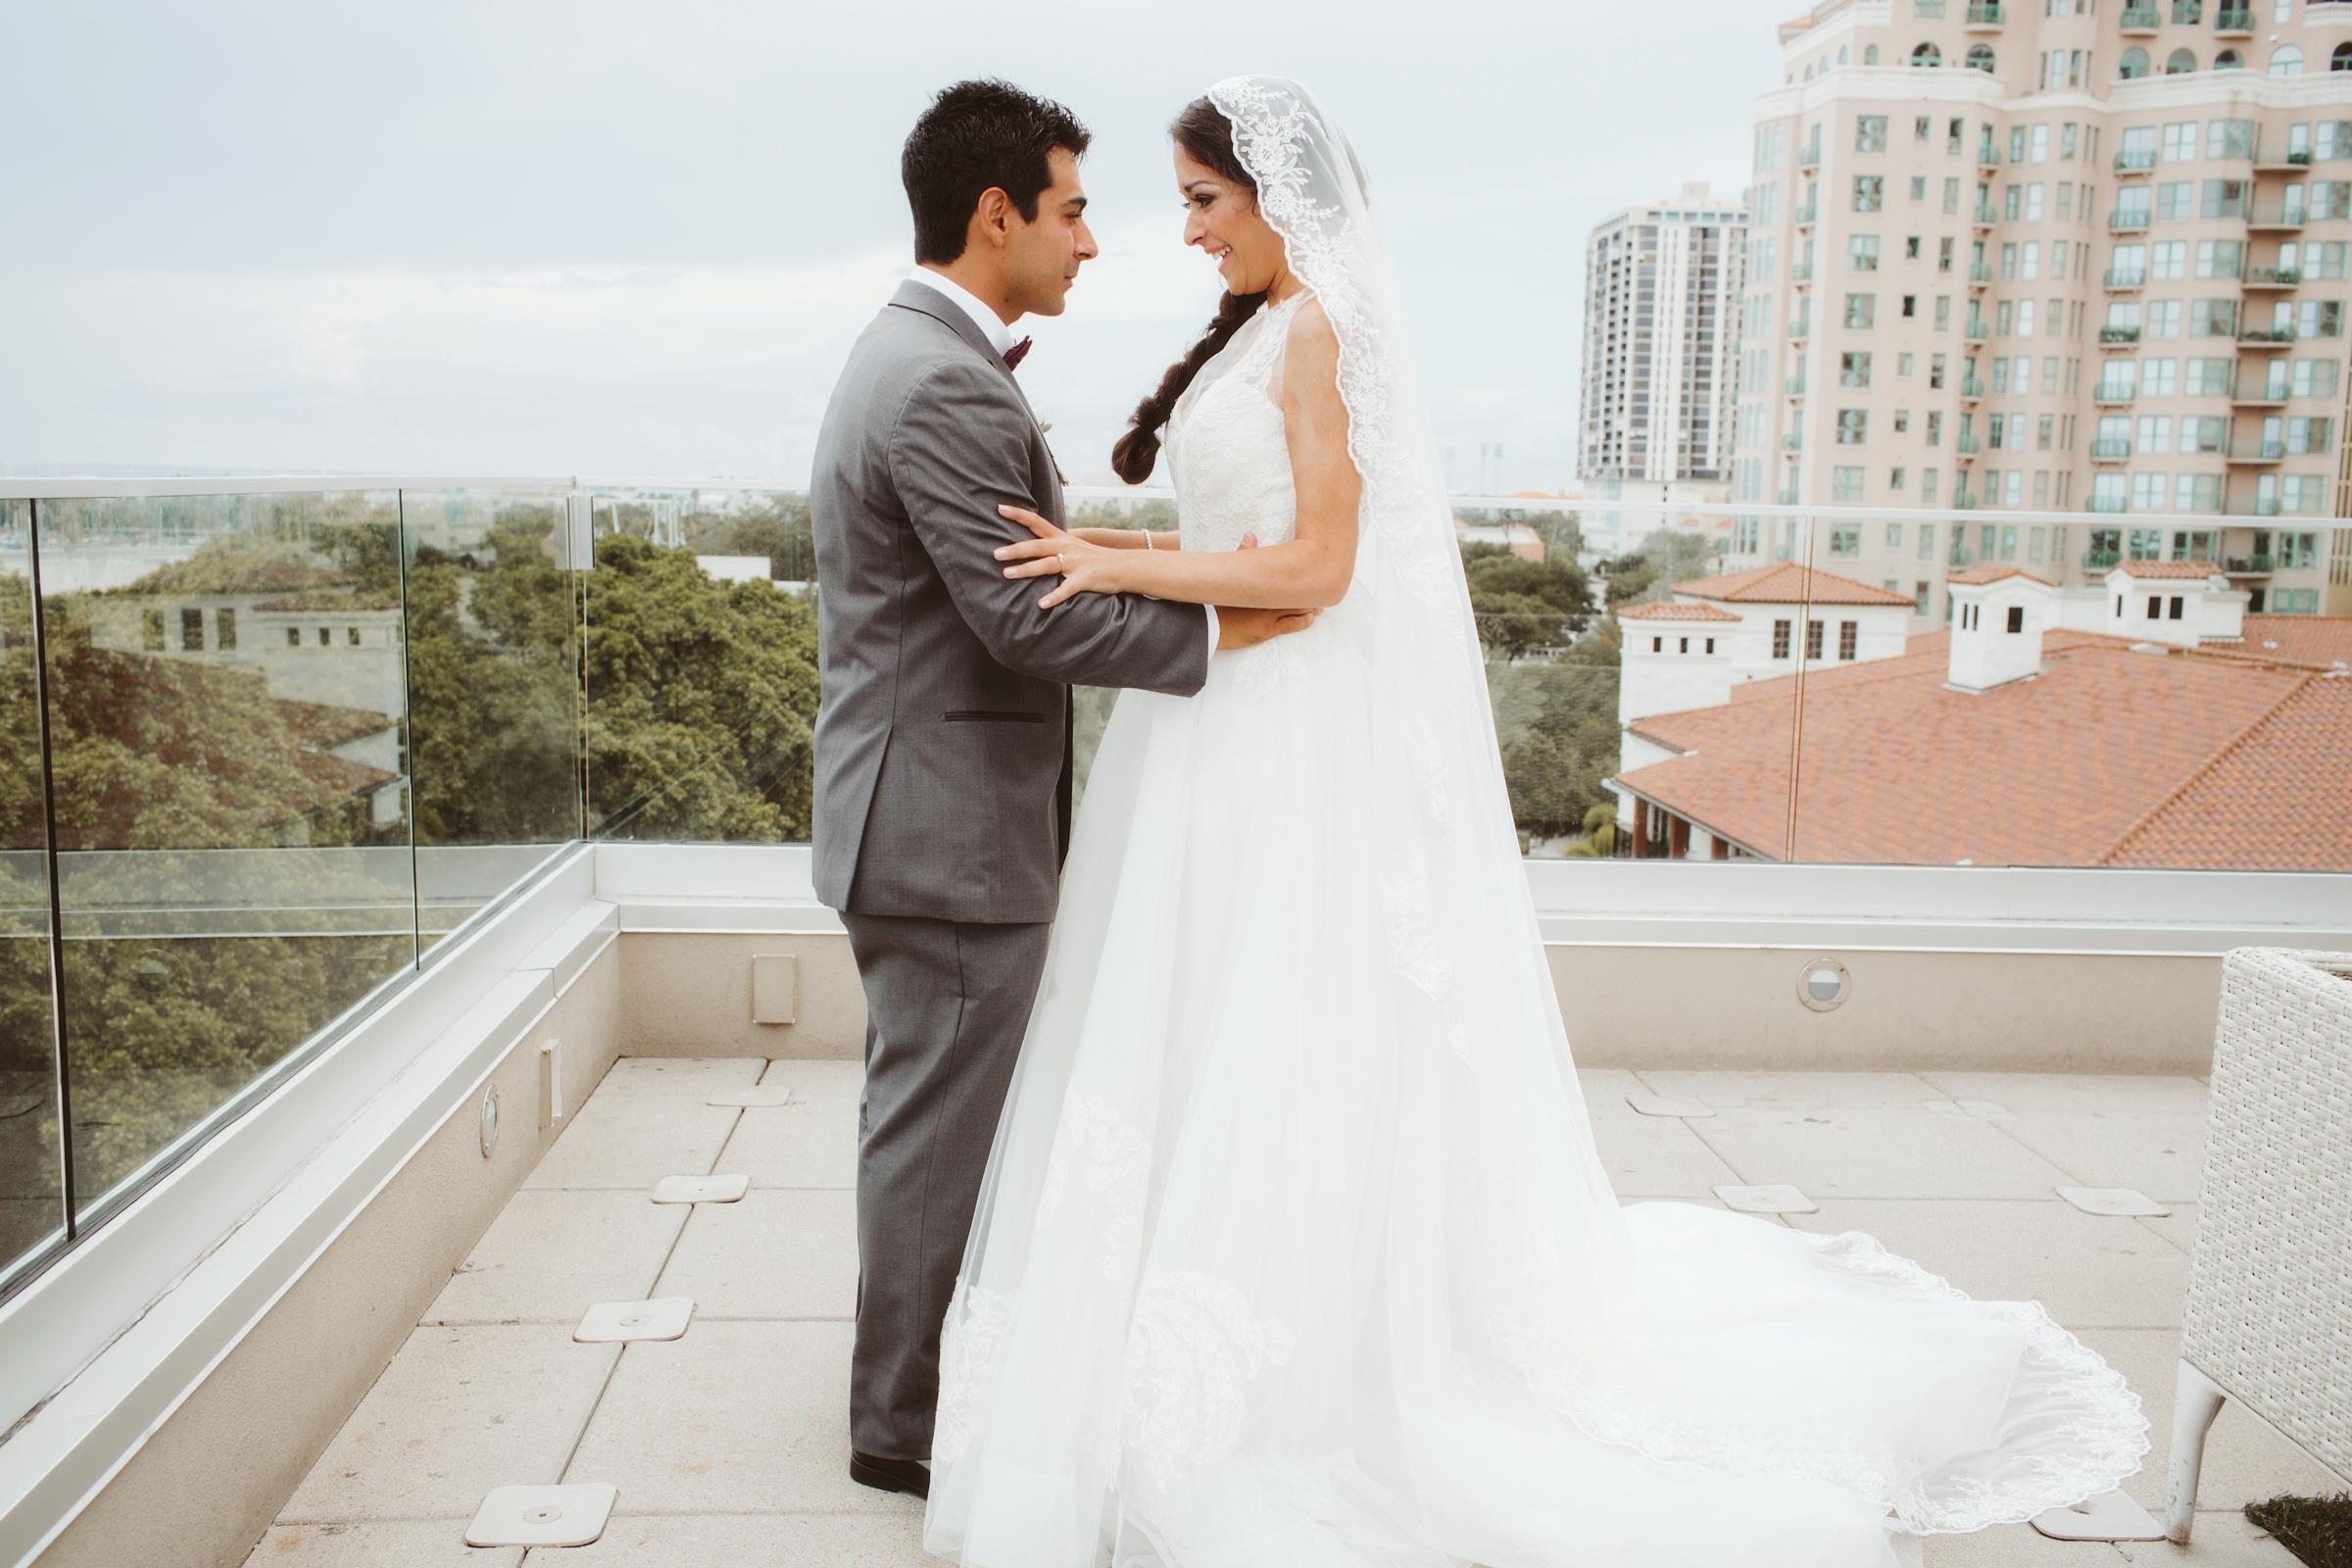 wedding day | MFA St Pete | Vanessa Boy Photography | vanessaboy.com-152.com |final.jpg